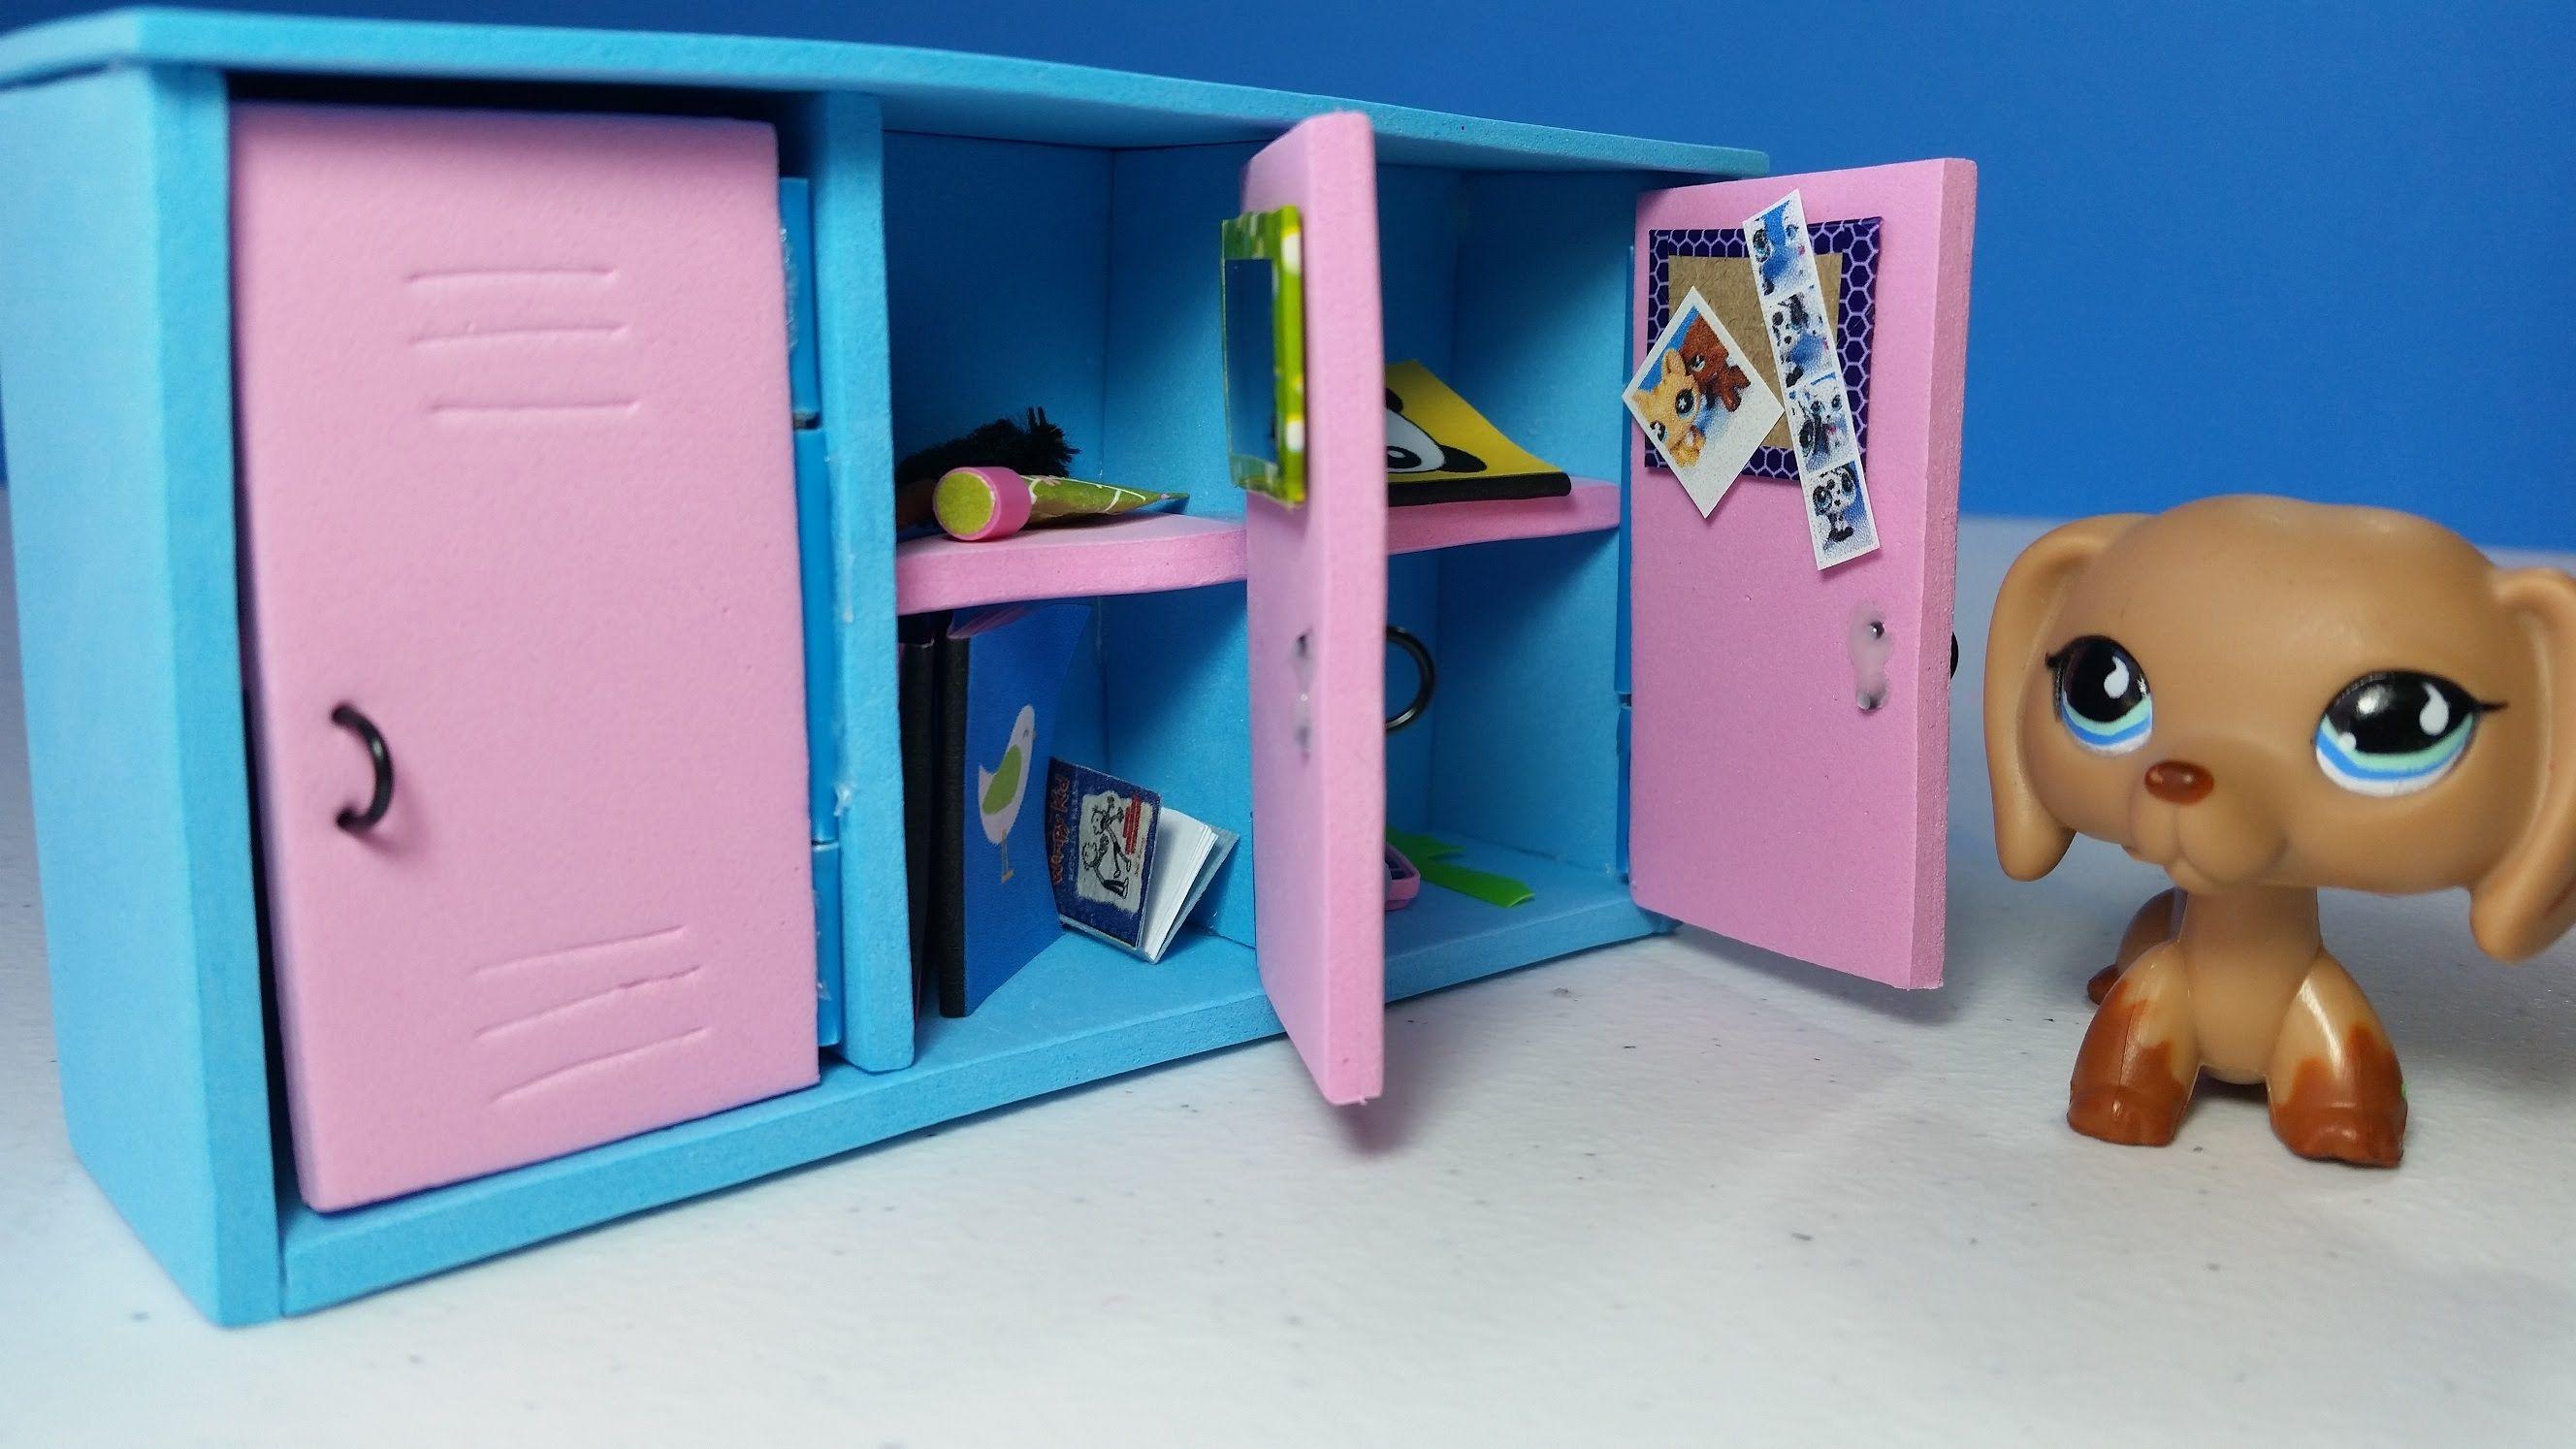 Diy Doll Lockers For Lps Or Mlp Lps Diy Accessories Diy Doll Locker Lps Crafts